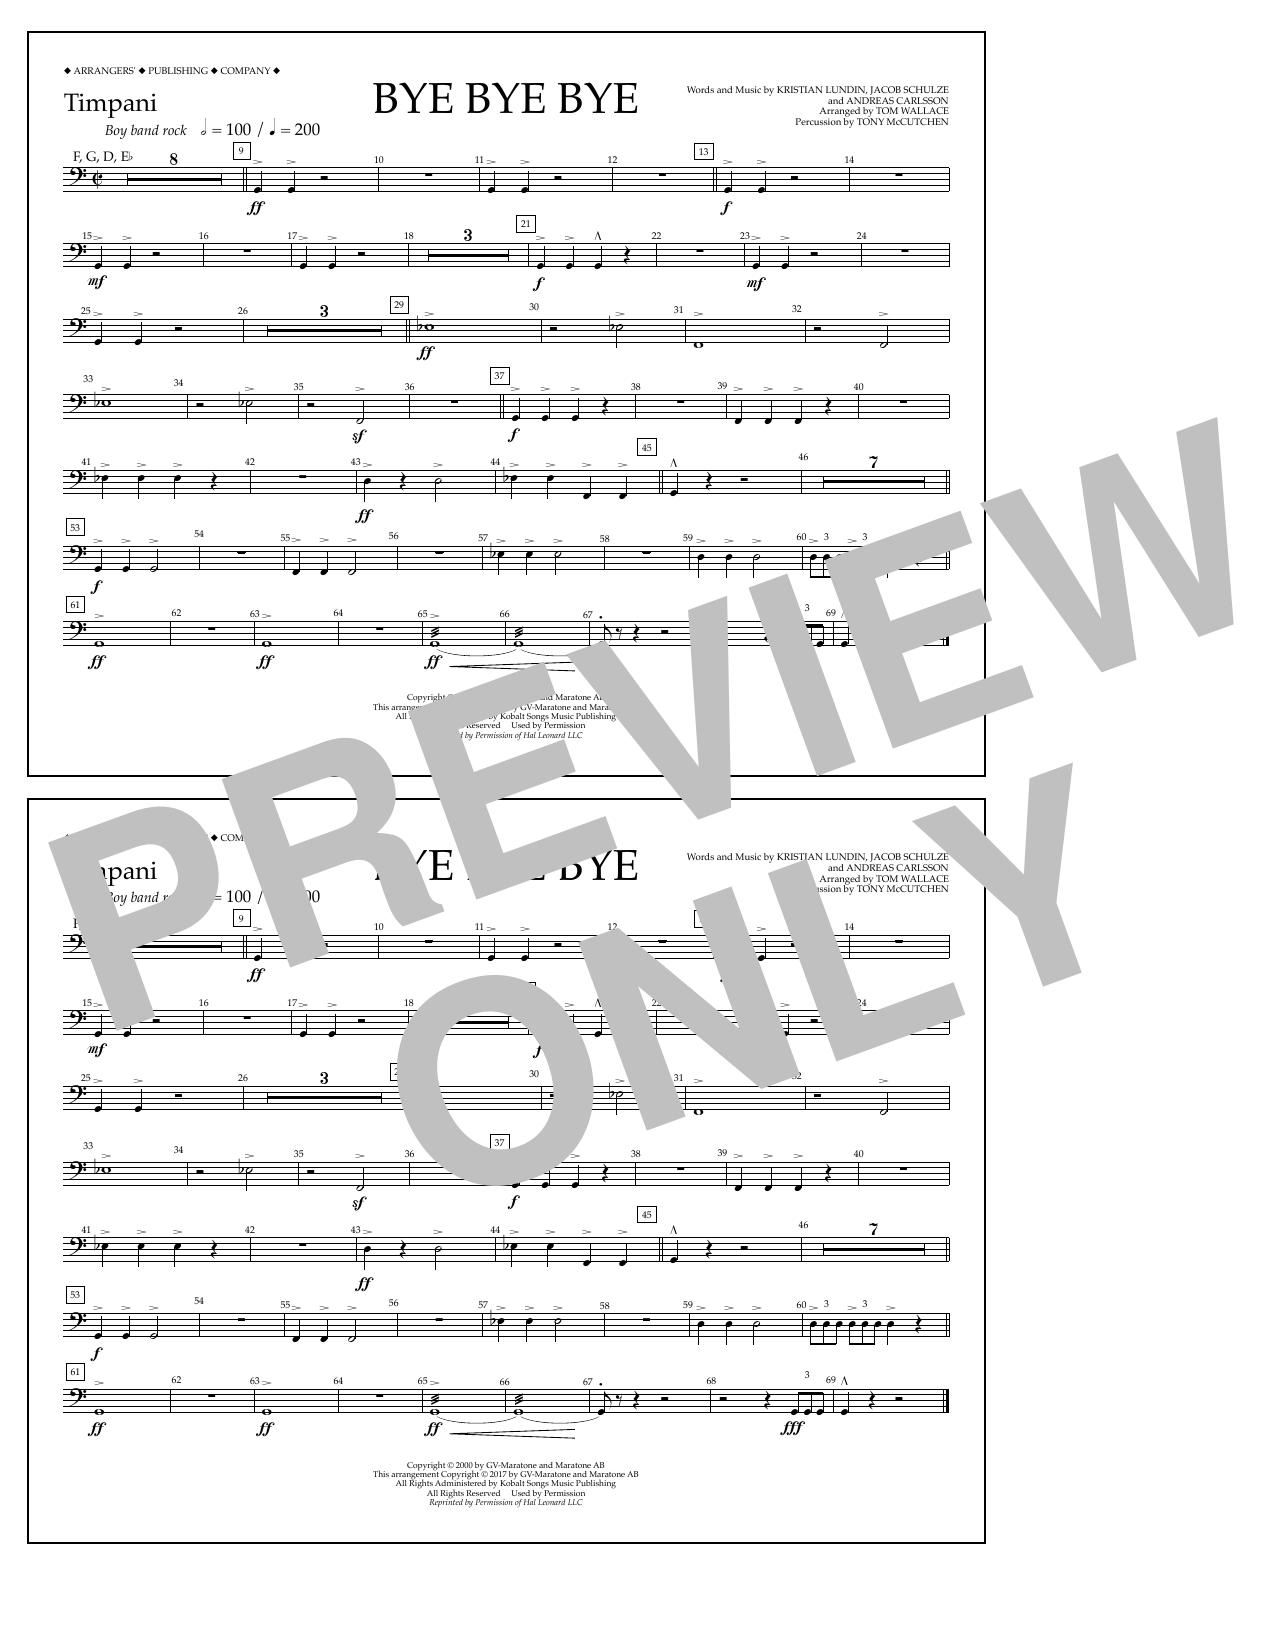 Bye Bye Bye Timpani By Andreas Carlsson Jake Carlsson Kristian Lundin Arrangers Publishing Company Prima Music